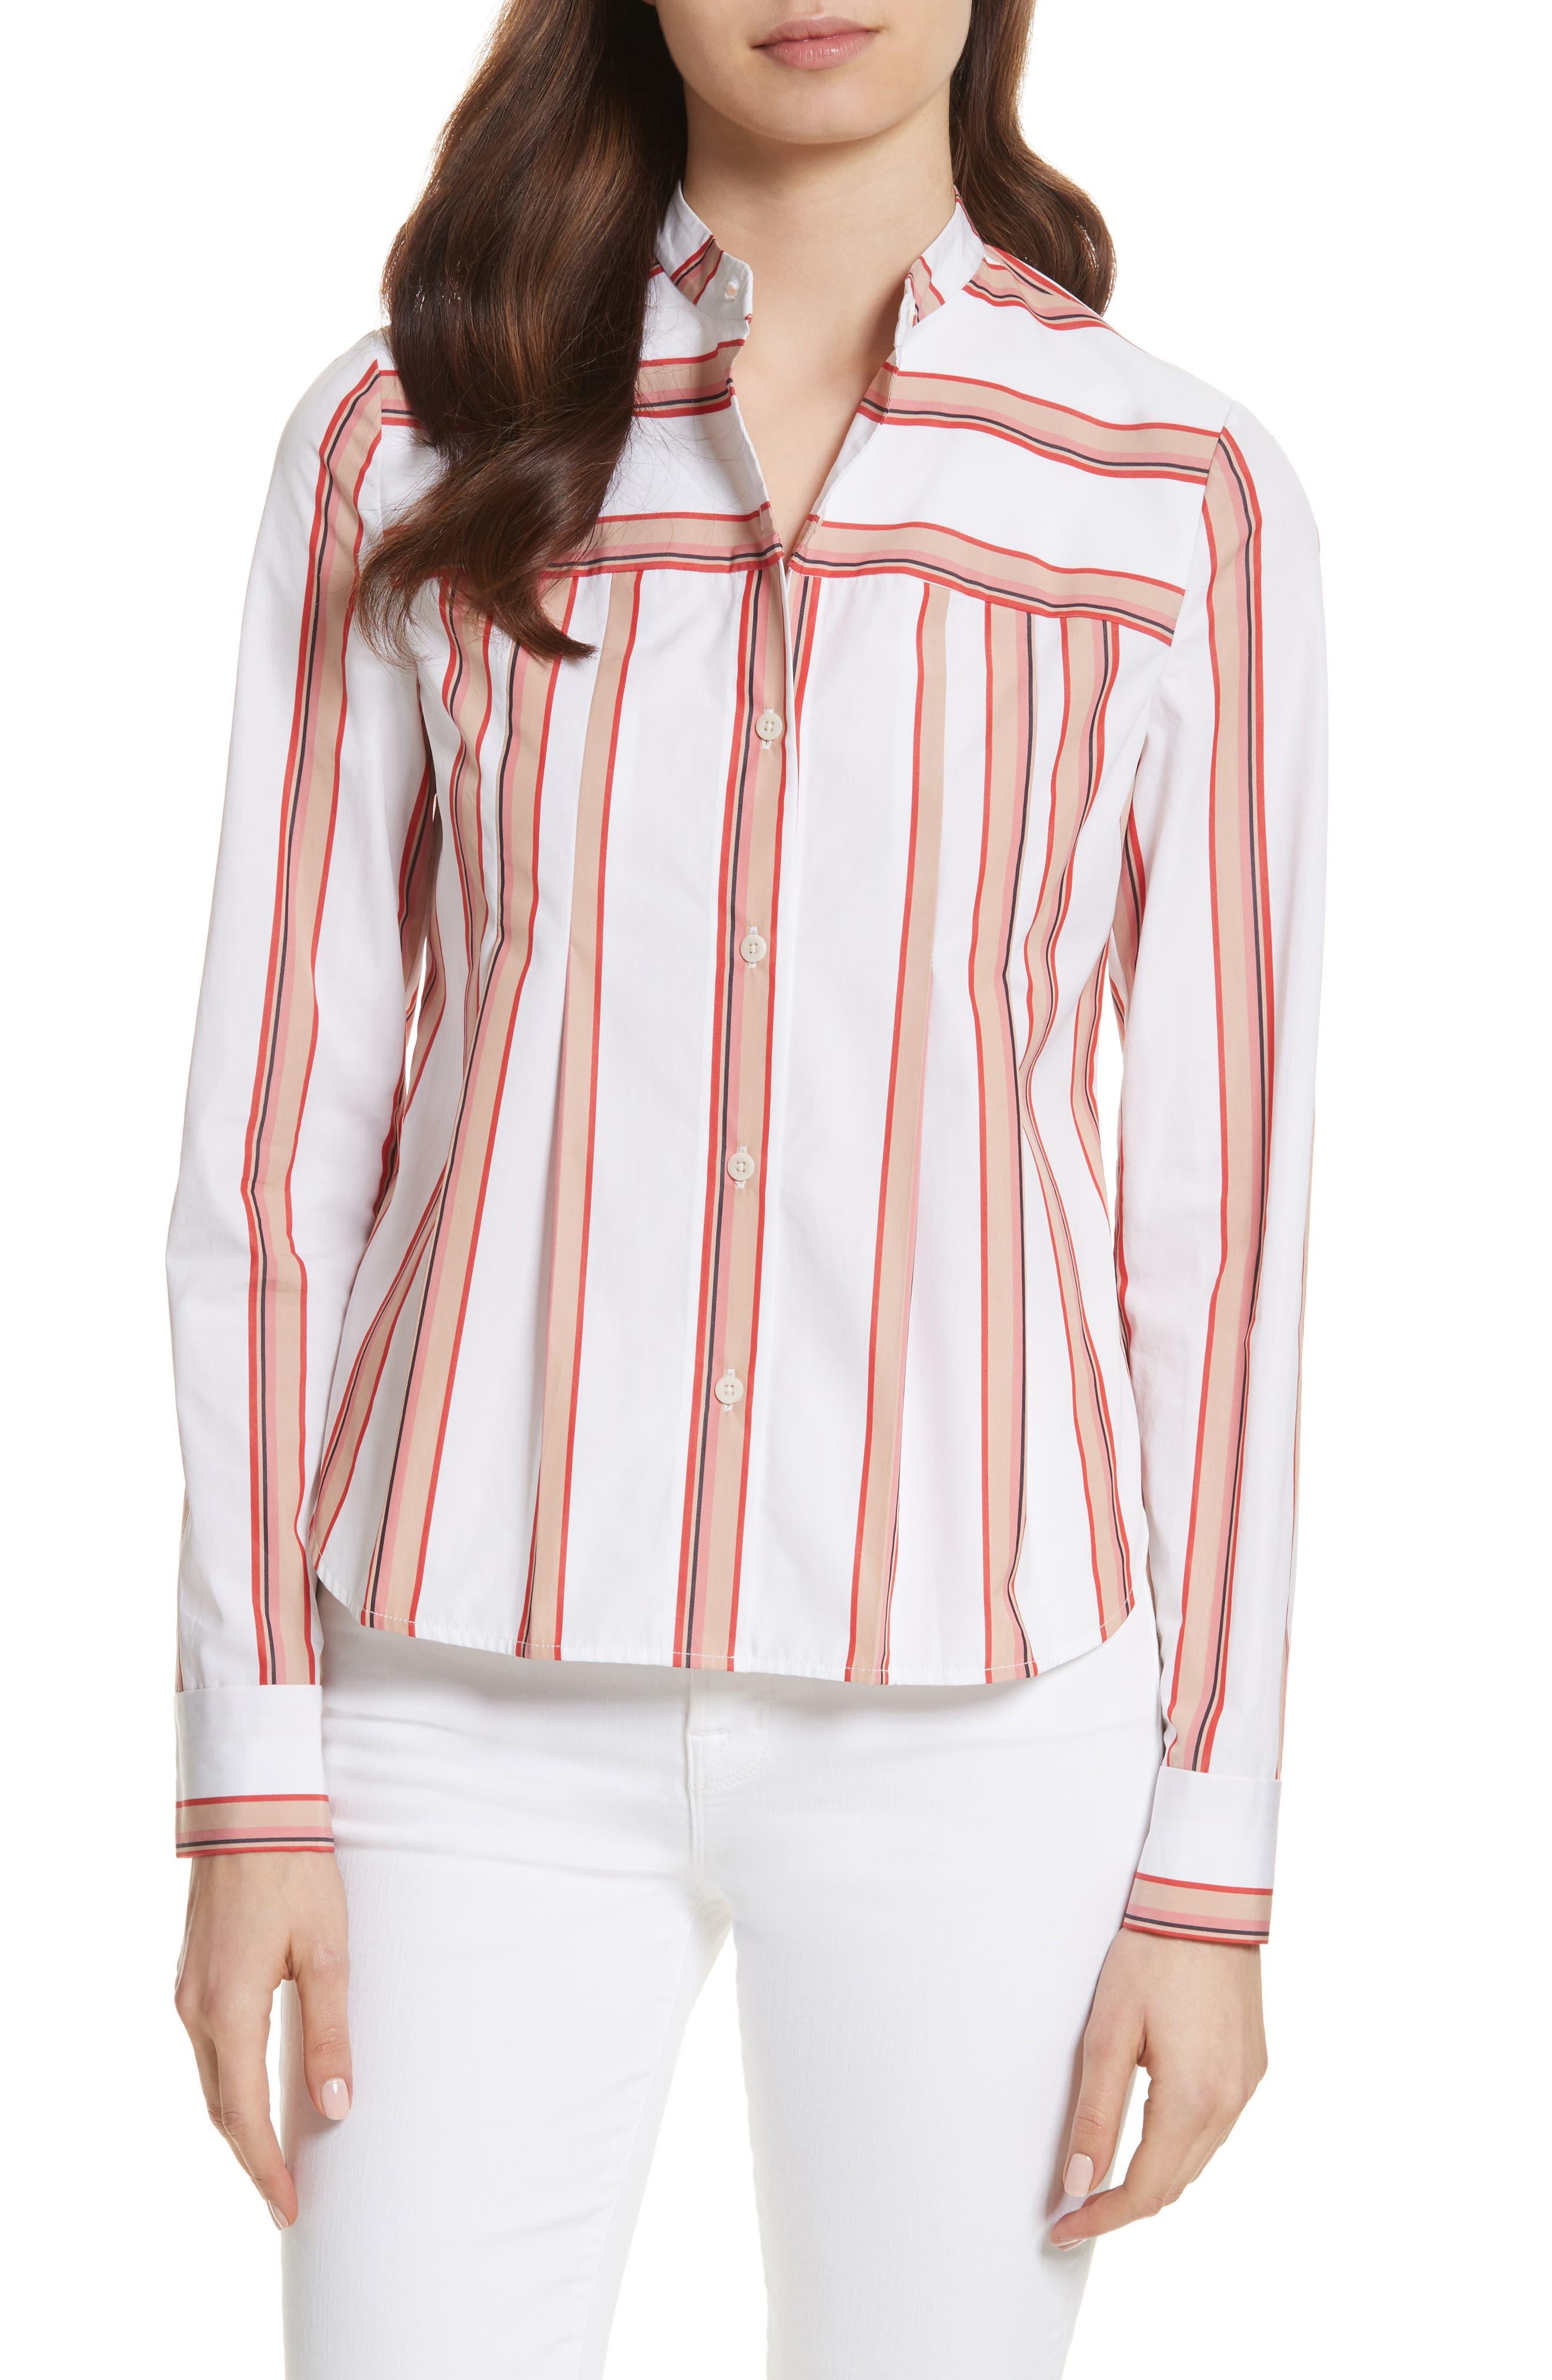 Diane von Furstenberg Stripe Shirt,                             Main thumbnail 1, color,                             107